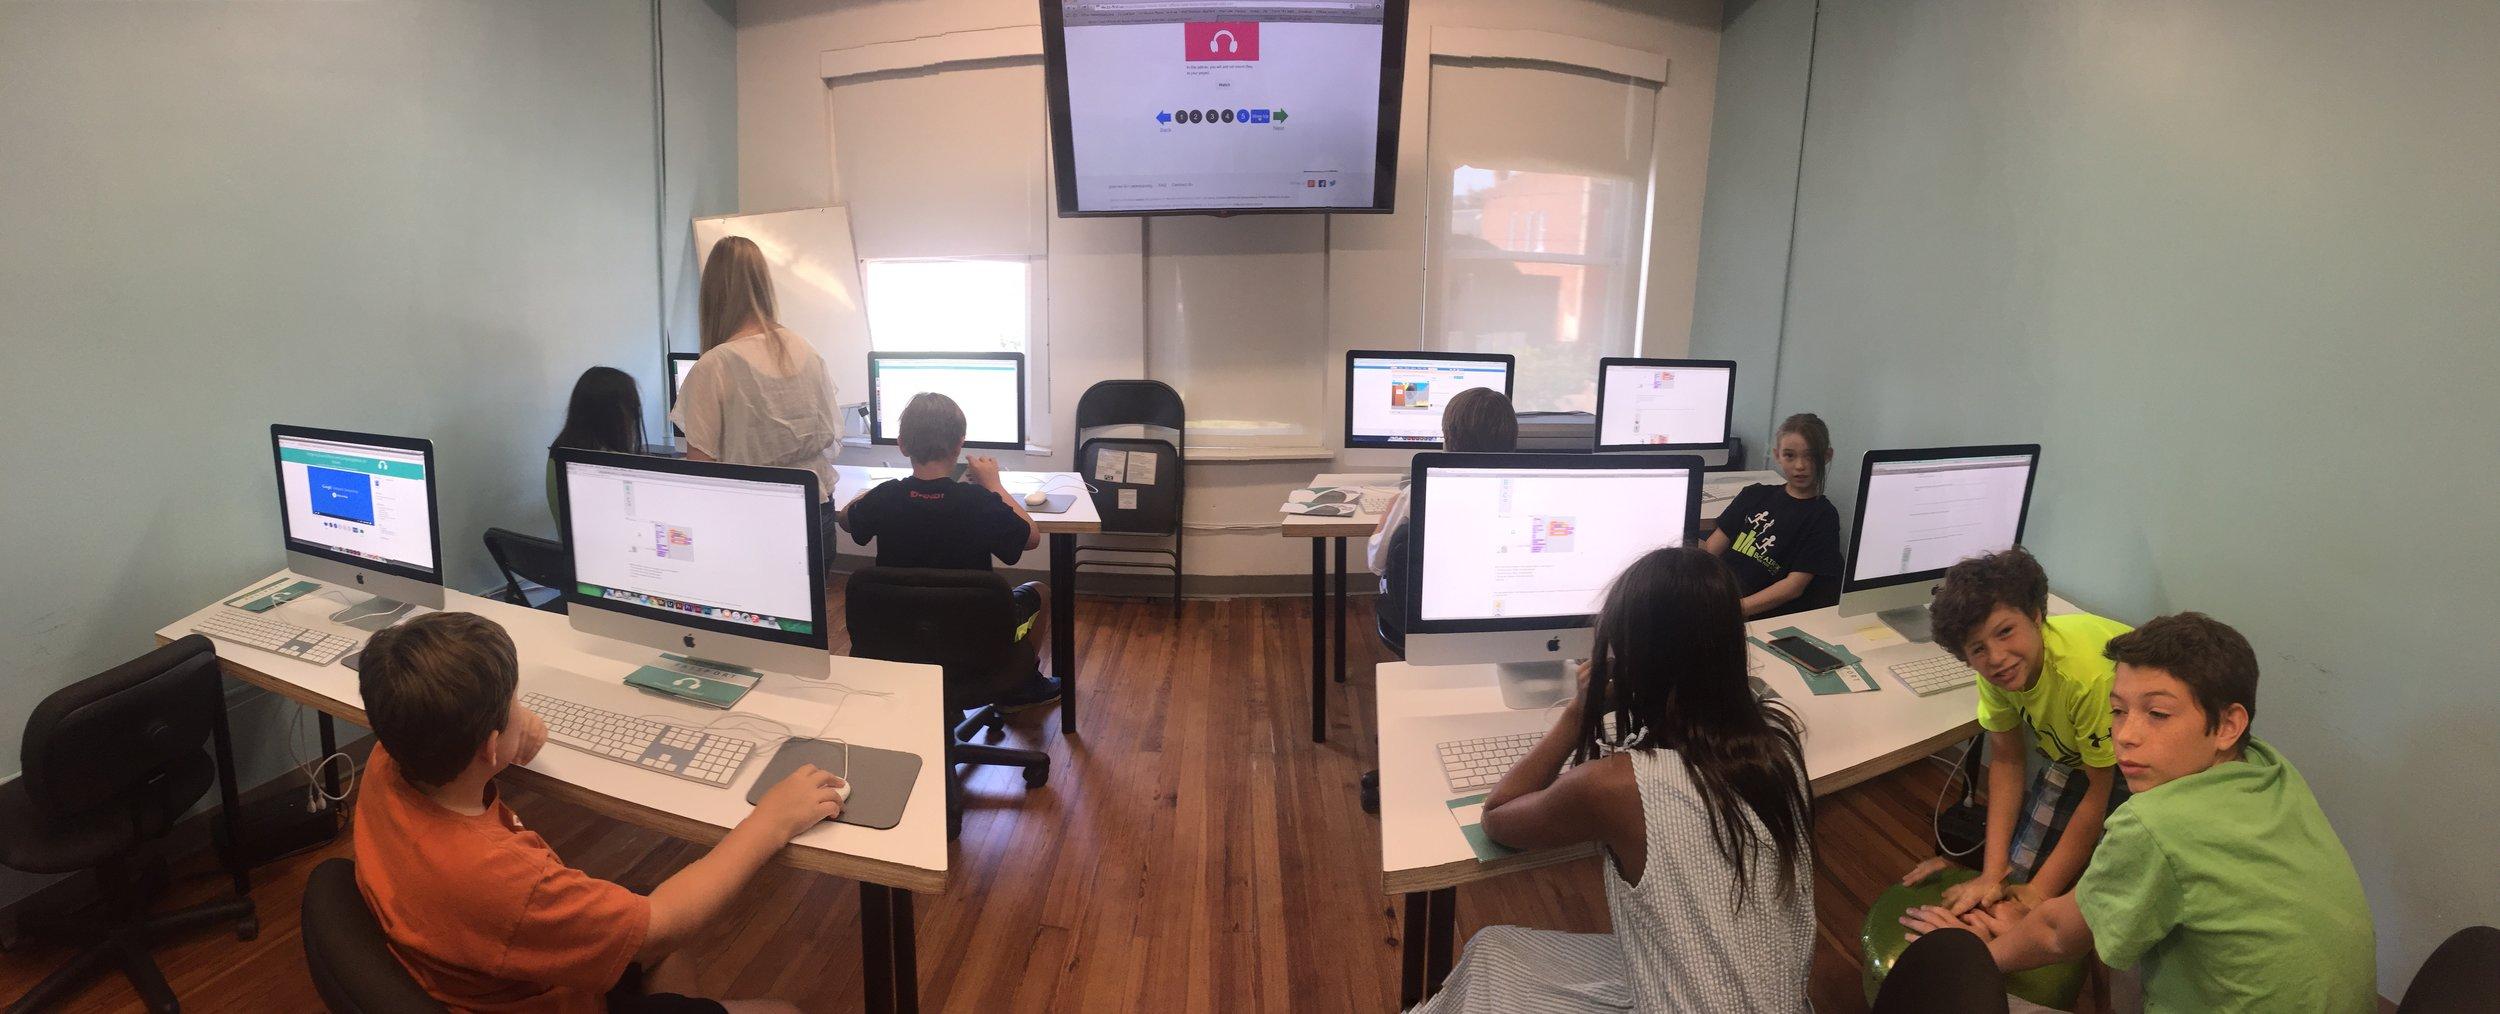 STEM-based coding during Summer Artventure programs, 2016